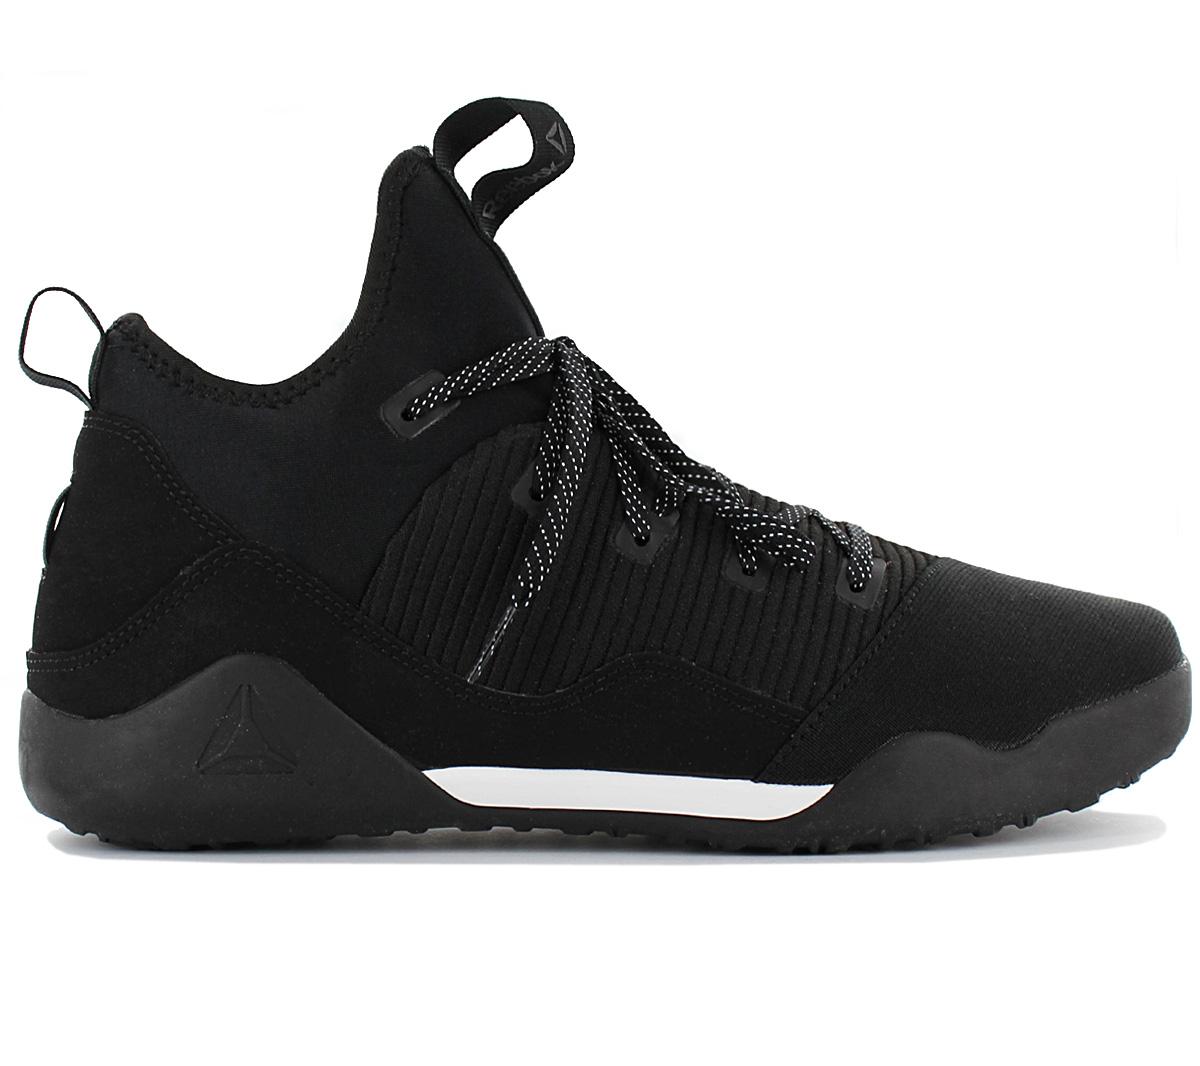 Details about Reebok Combat Noble Trainer Men's Training Fitness Shoes CN0742 Black Workout